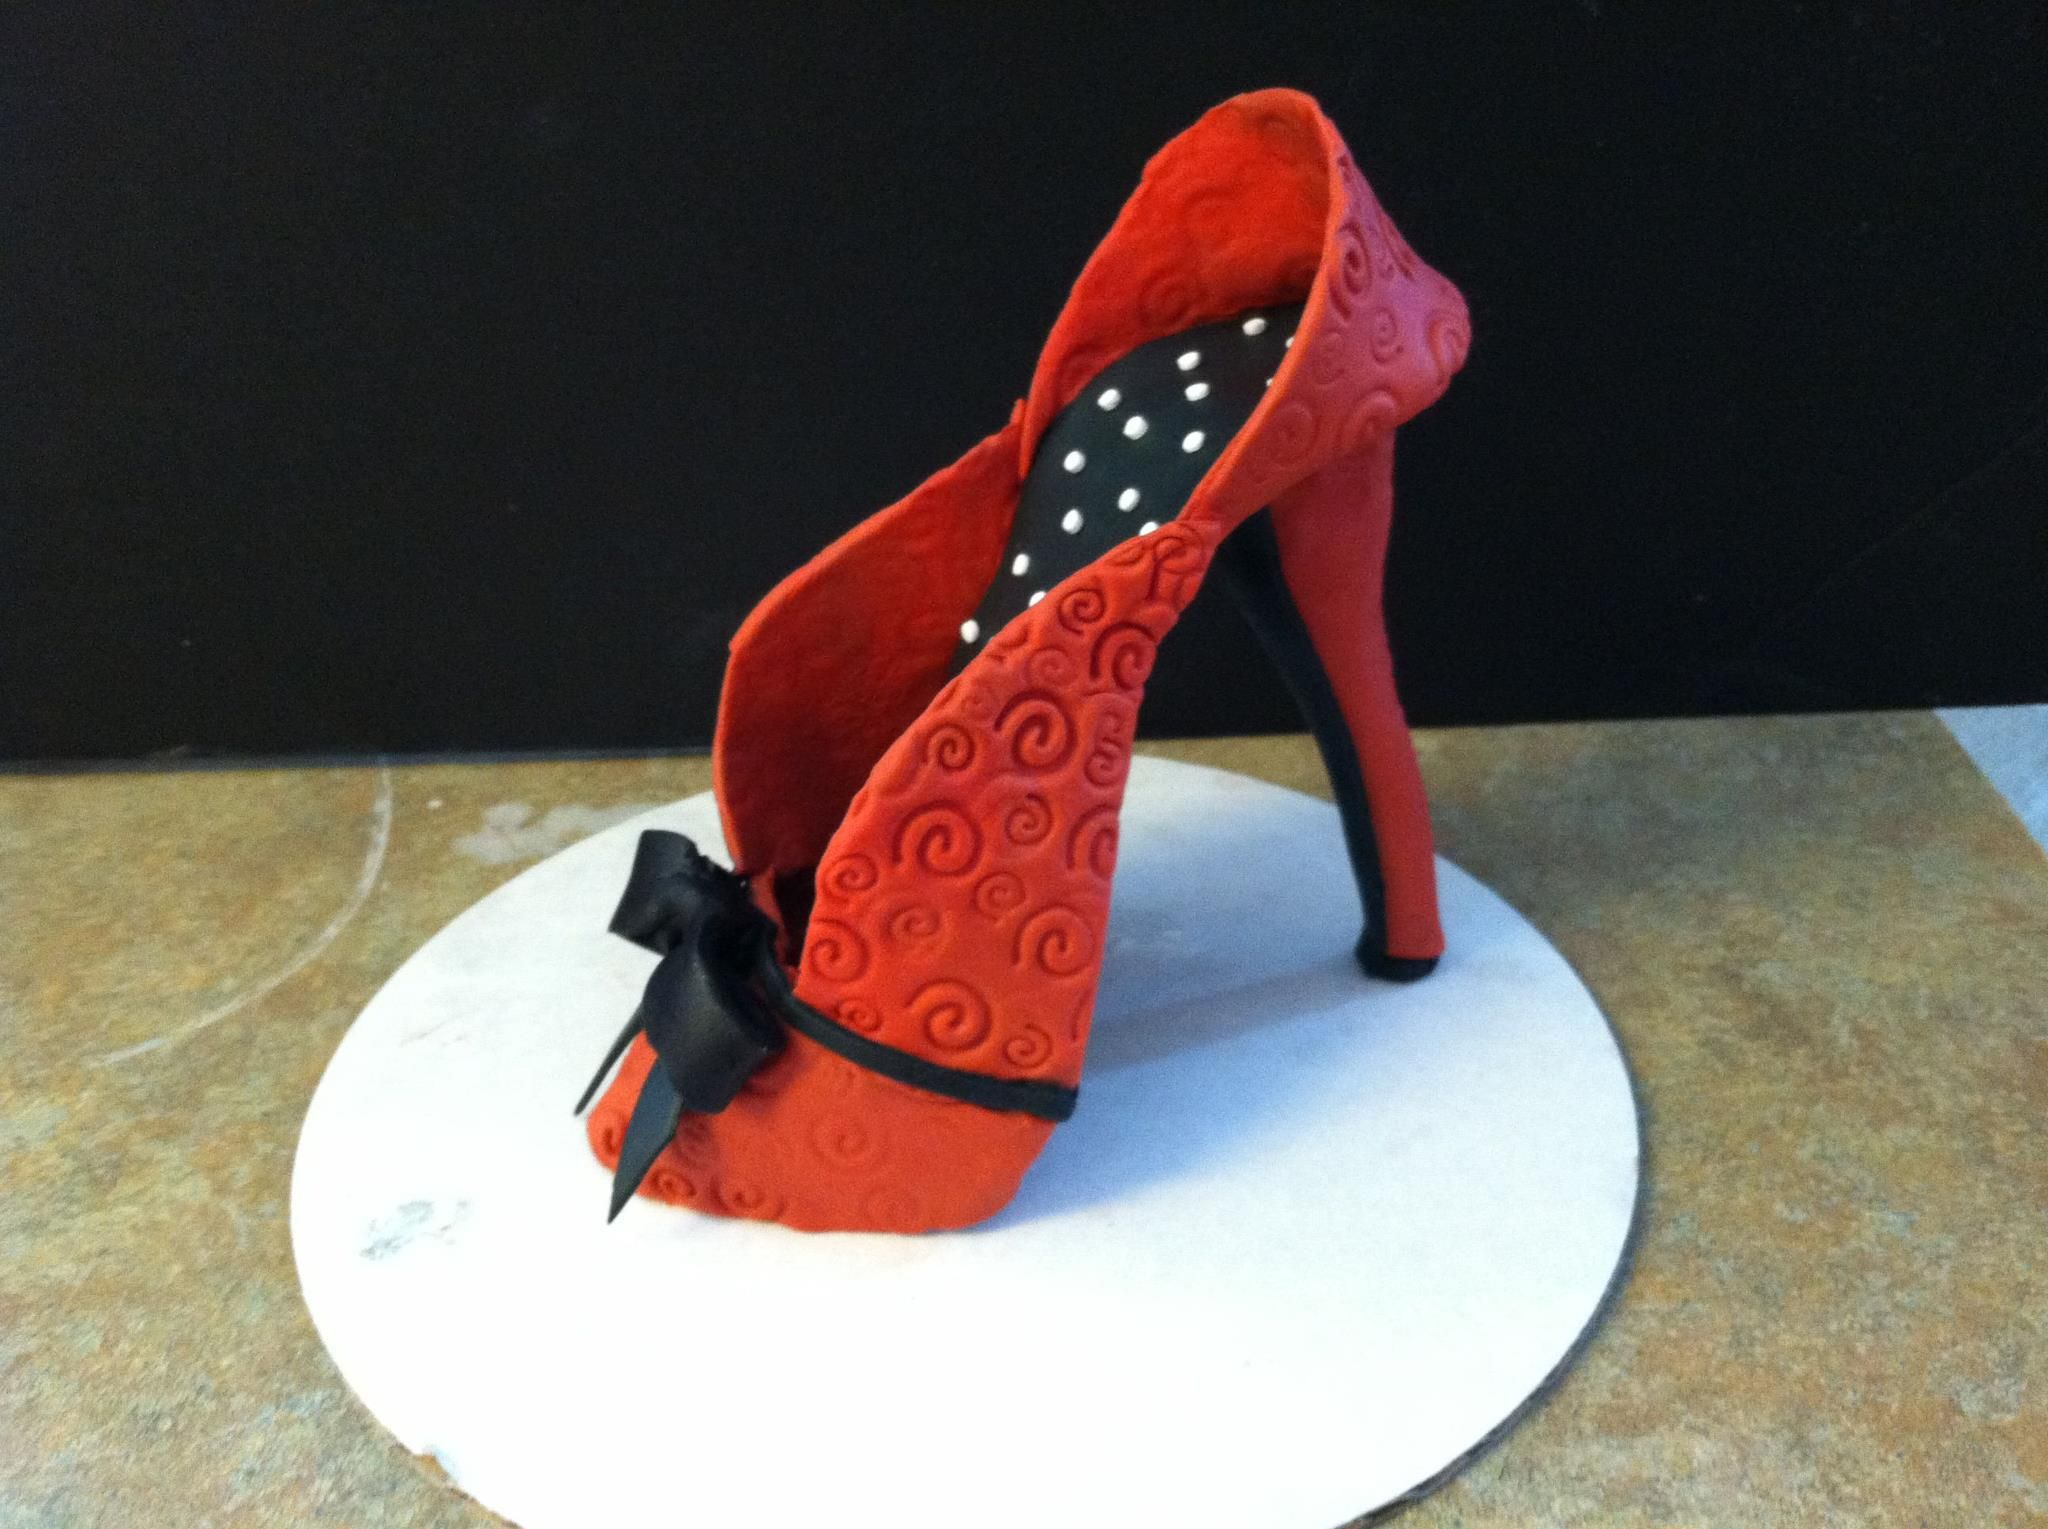 a gumpaste shoe w/o the crooked heel! Lol